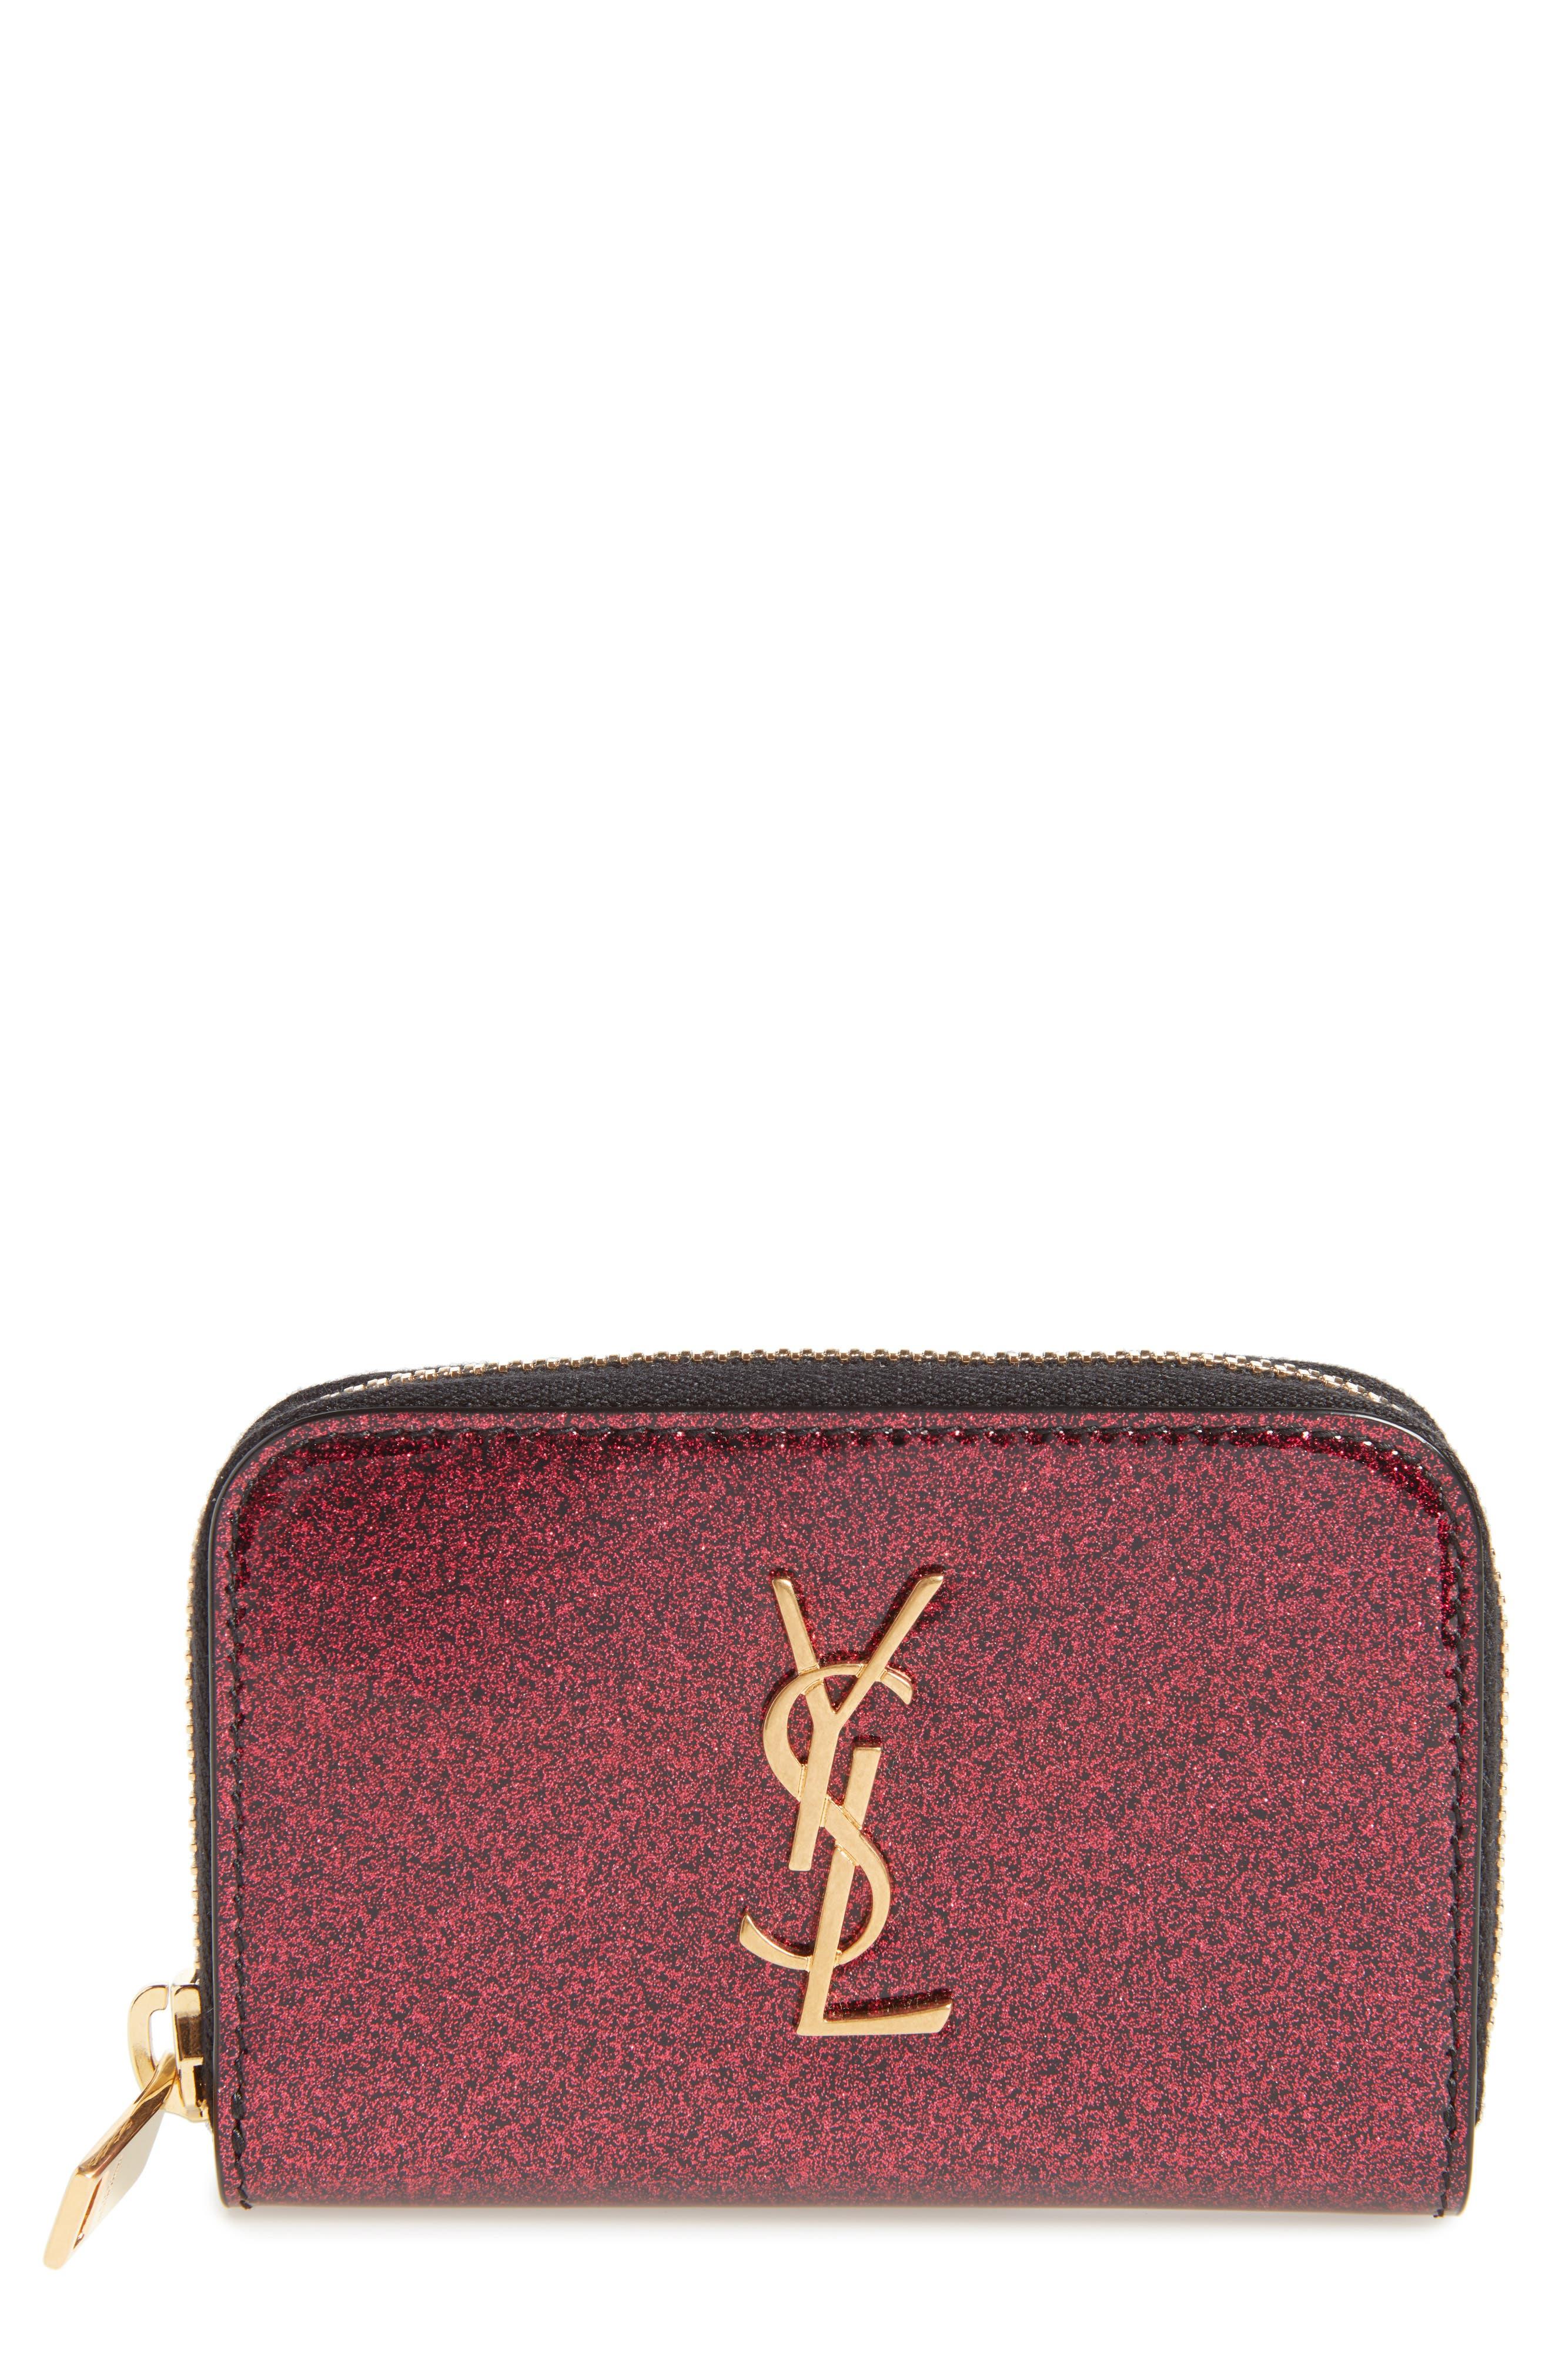 SAINT LAURENT Glitter Calfskin Leather Wallet, Main, color, SHOCKING PINK/ NOIR